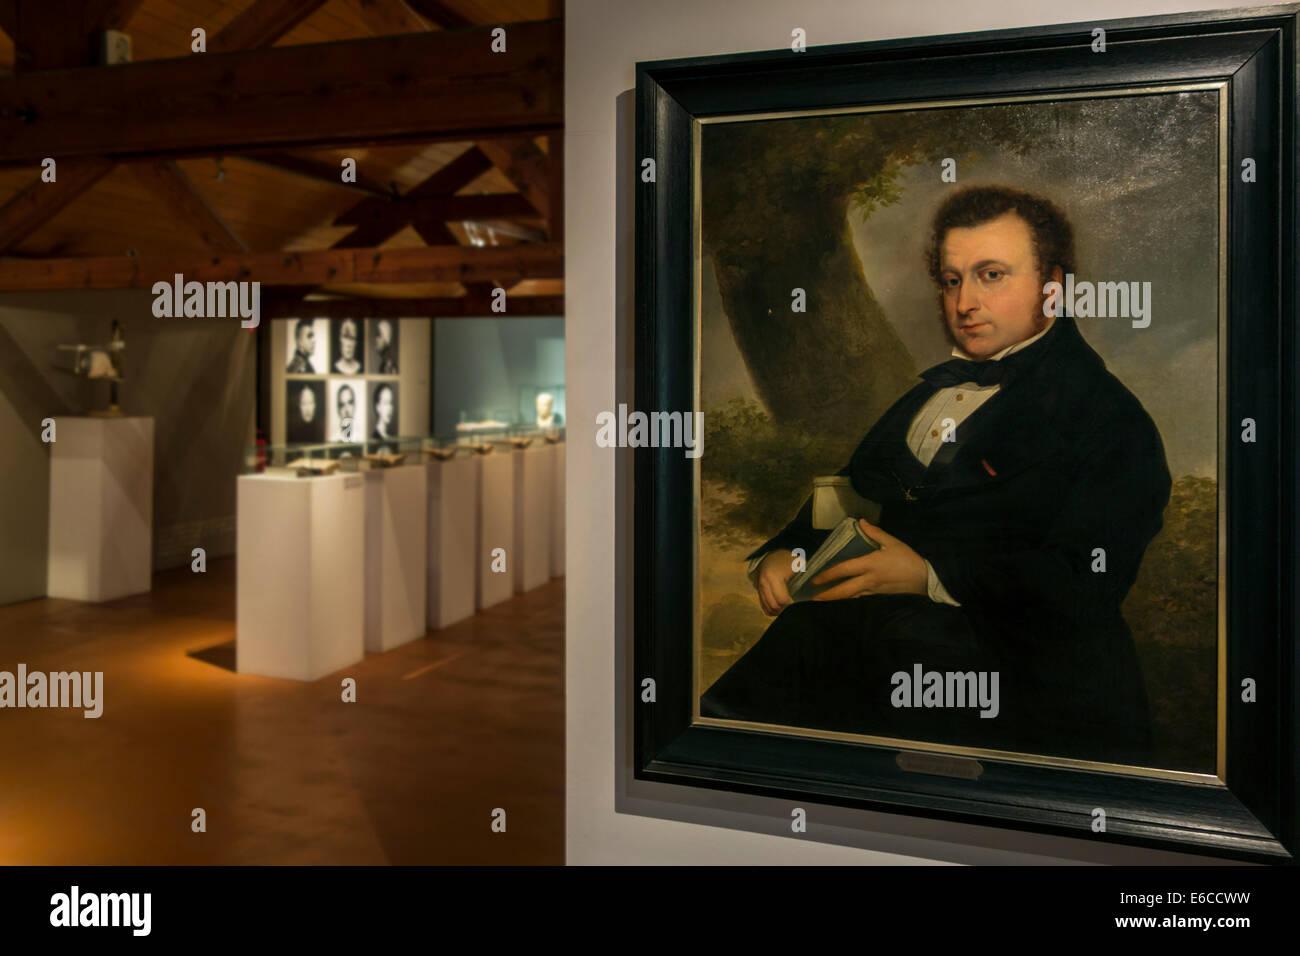 Malerei der Arzt Joseph Guislain, belgischen Arzt und Pionier in der Psychiatrie im Museum Dr. Guislain, Gent, Belgien Stockbild